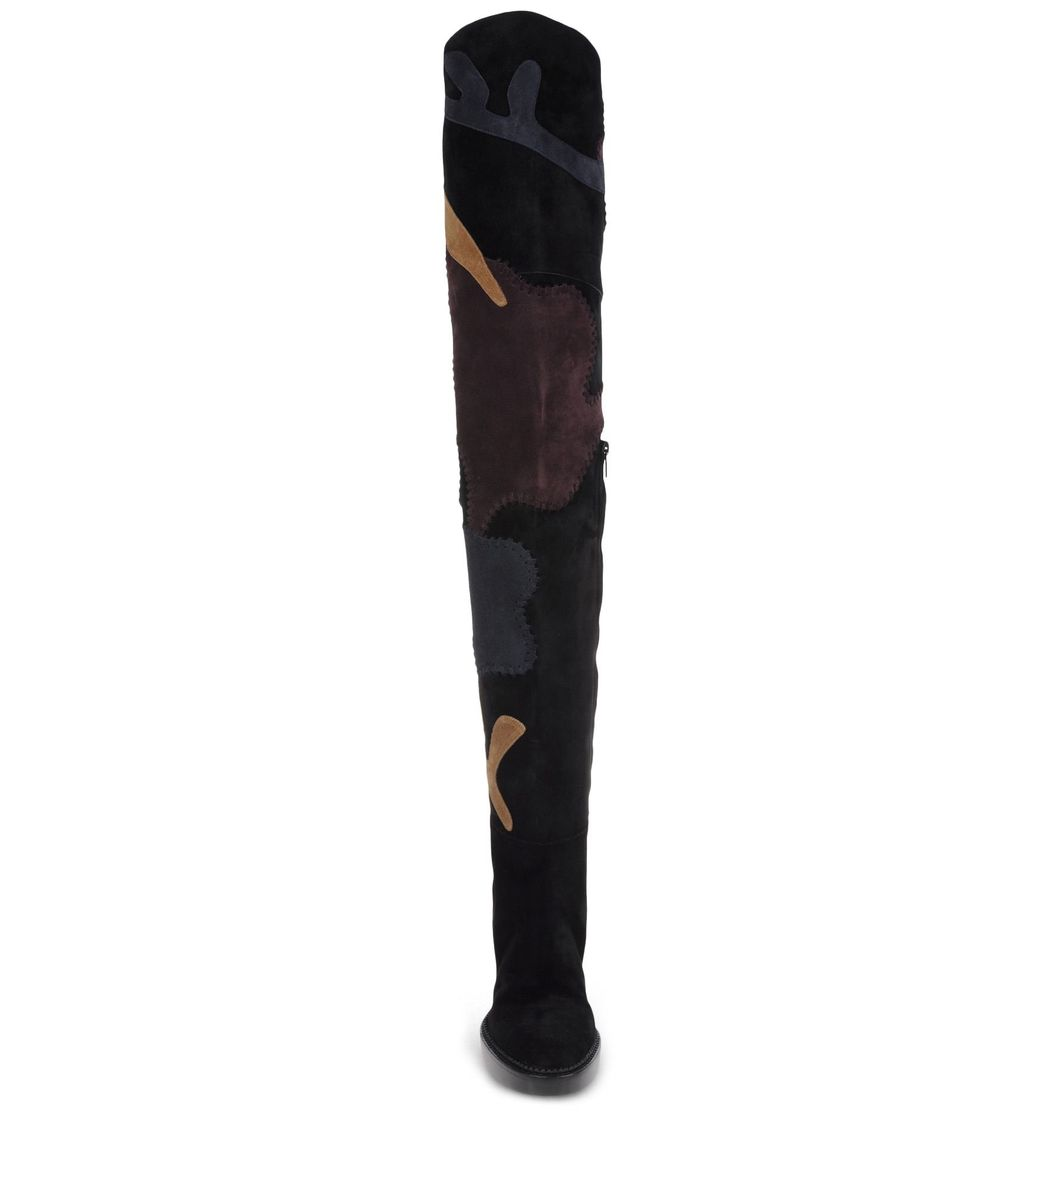 ShopBazaar Burberry Prorsum Patchwork Over-The-Knee Boot DETAIL